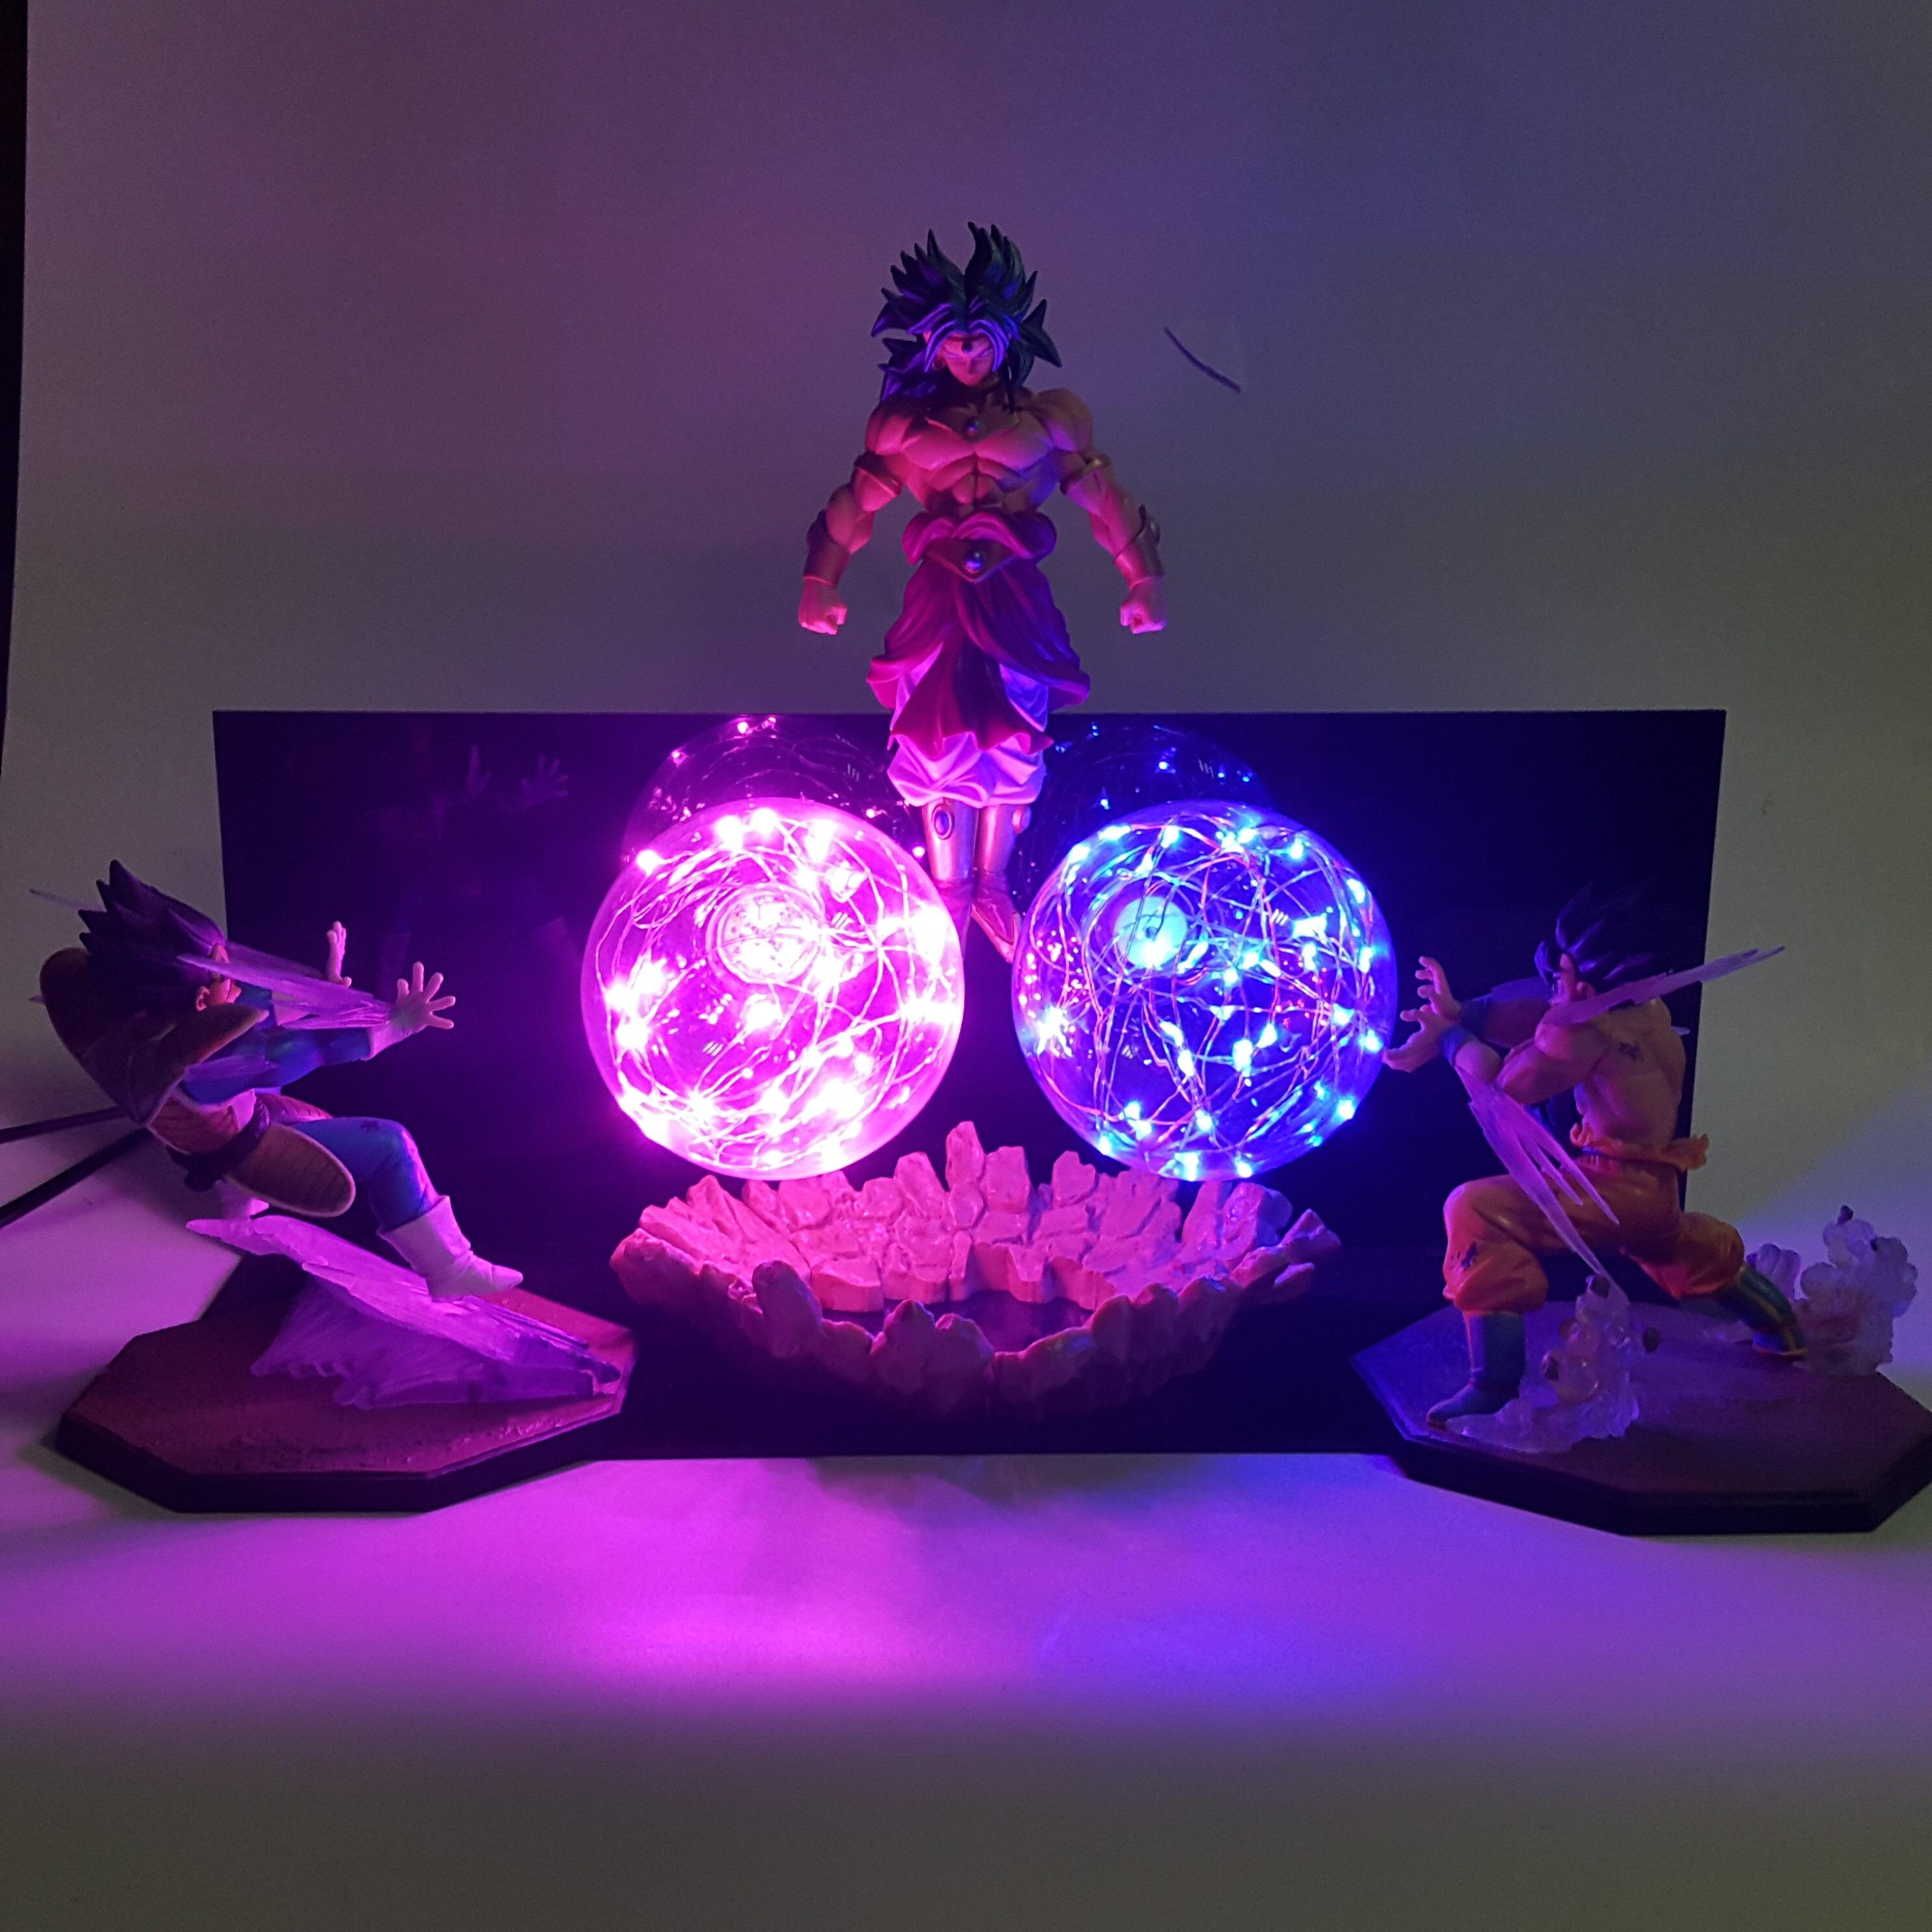 Dragon Ball Z Goku Vegeta vs Broly Led Lamp Action Figures Toy Anime Dragon Ball Super Kamehameha Figurine DBZ Brinquedos